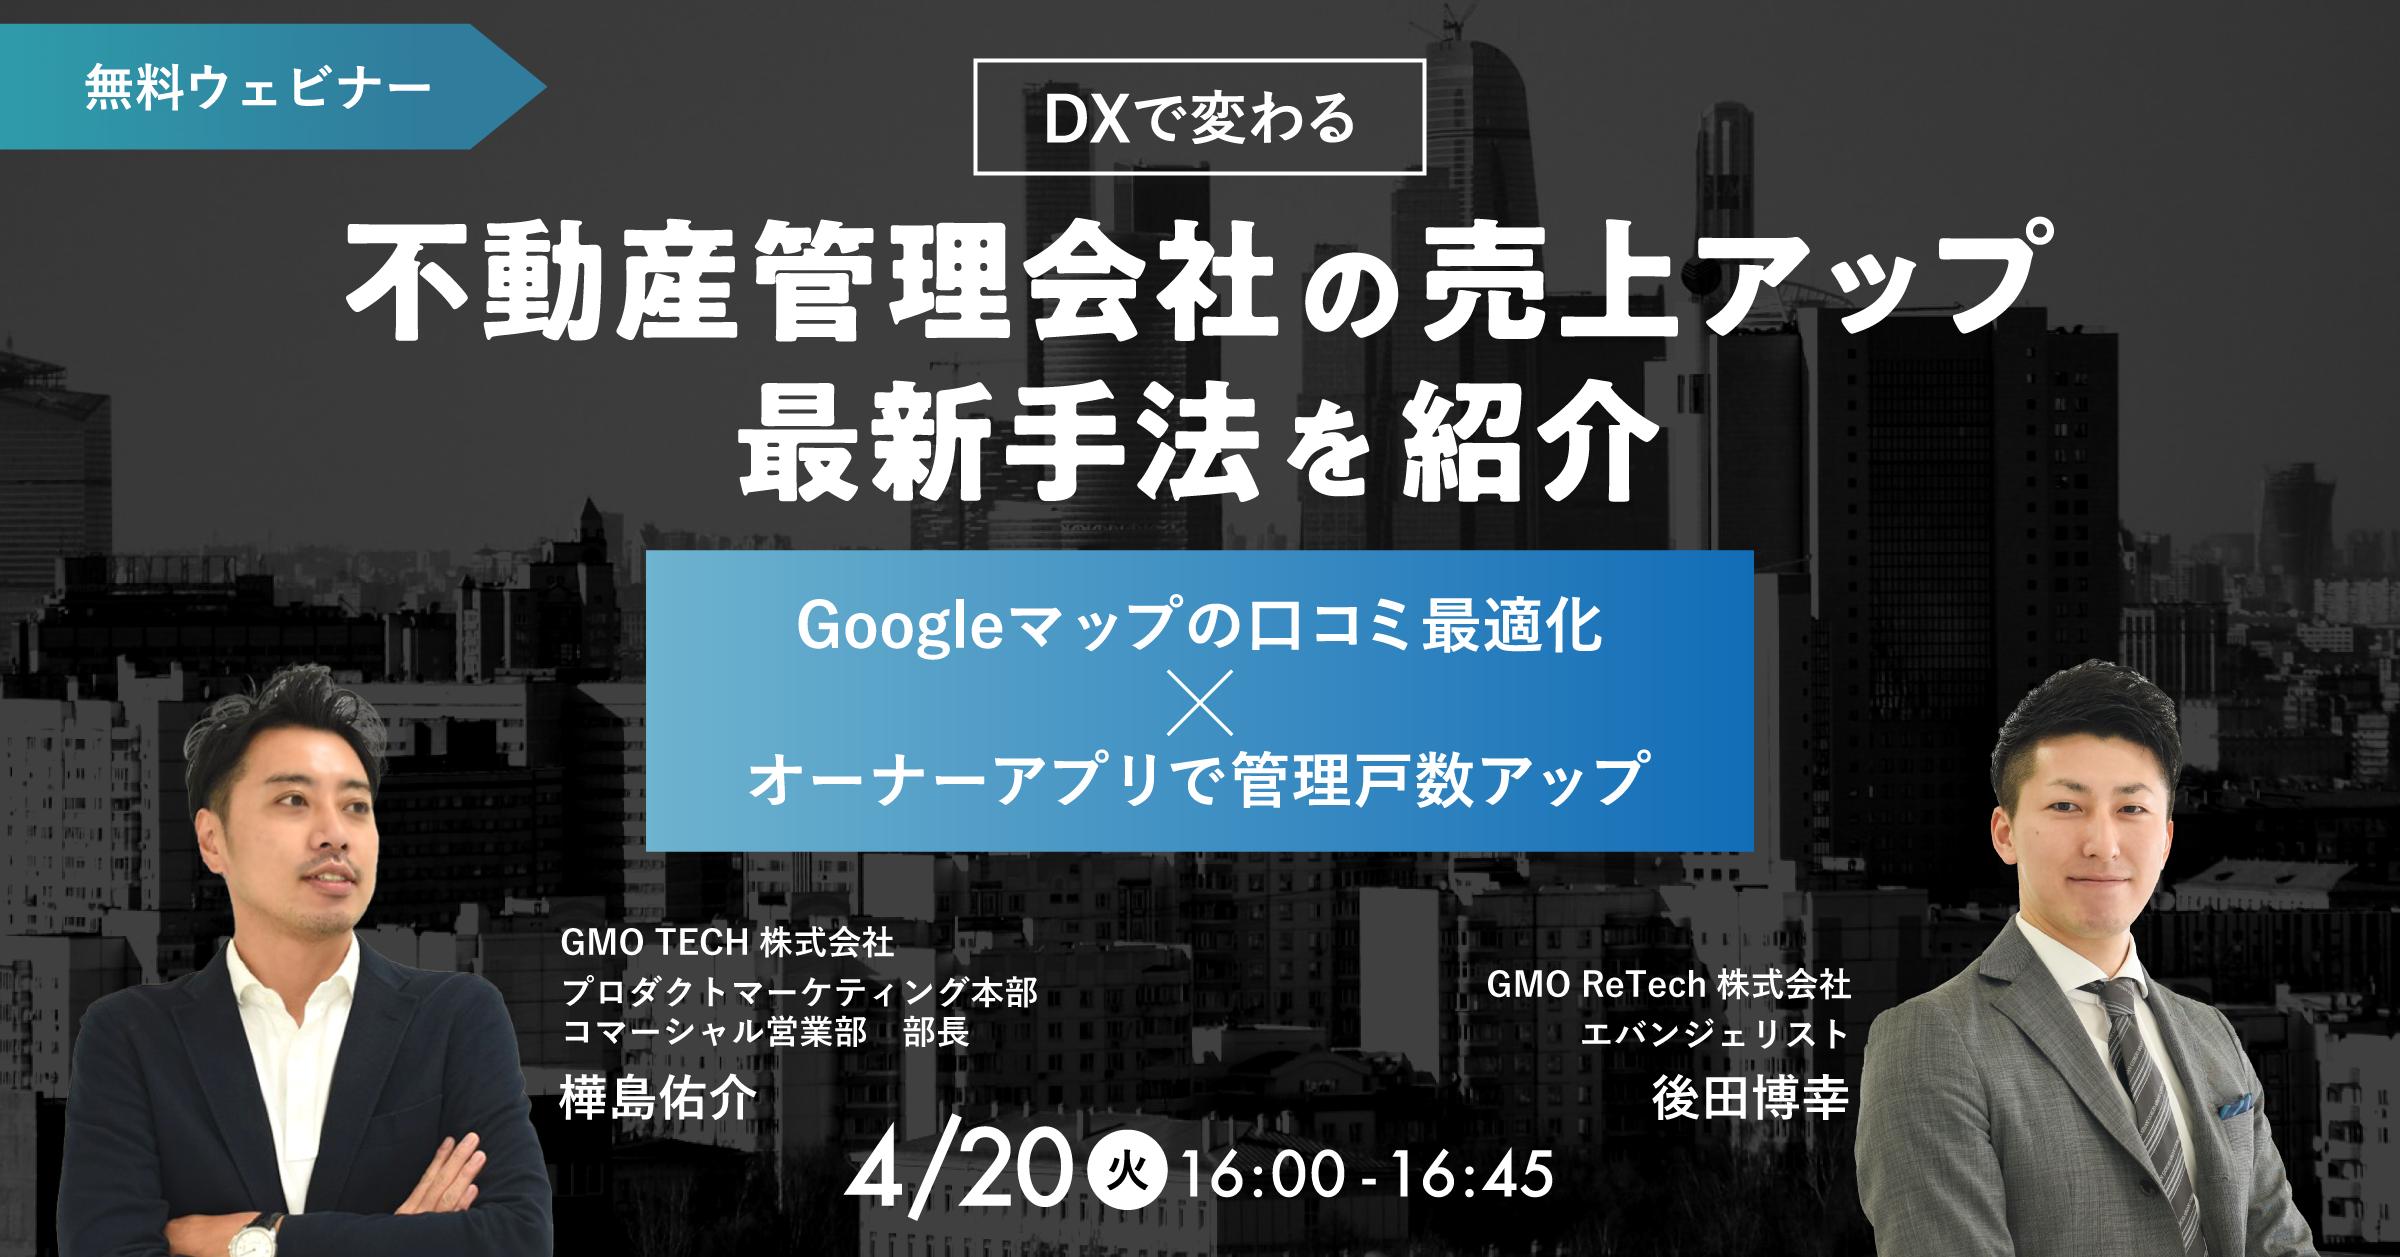 DXで変わる、不動産管理会社の売上アップ最新手法を紹介 〜 Googleマップの口コミ最適化 × オーナーアプリで管理戸数アップ 〜